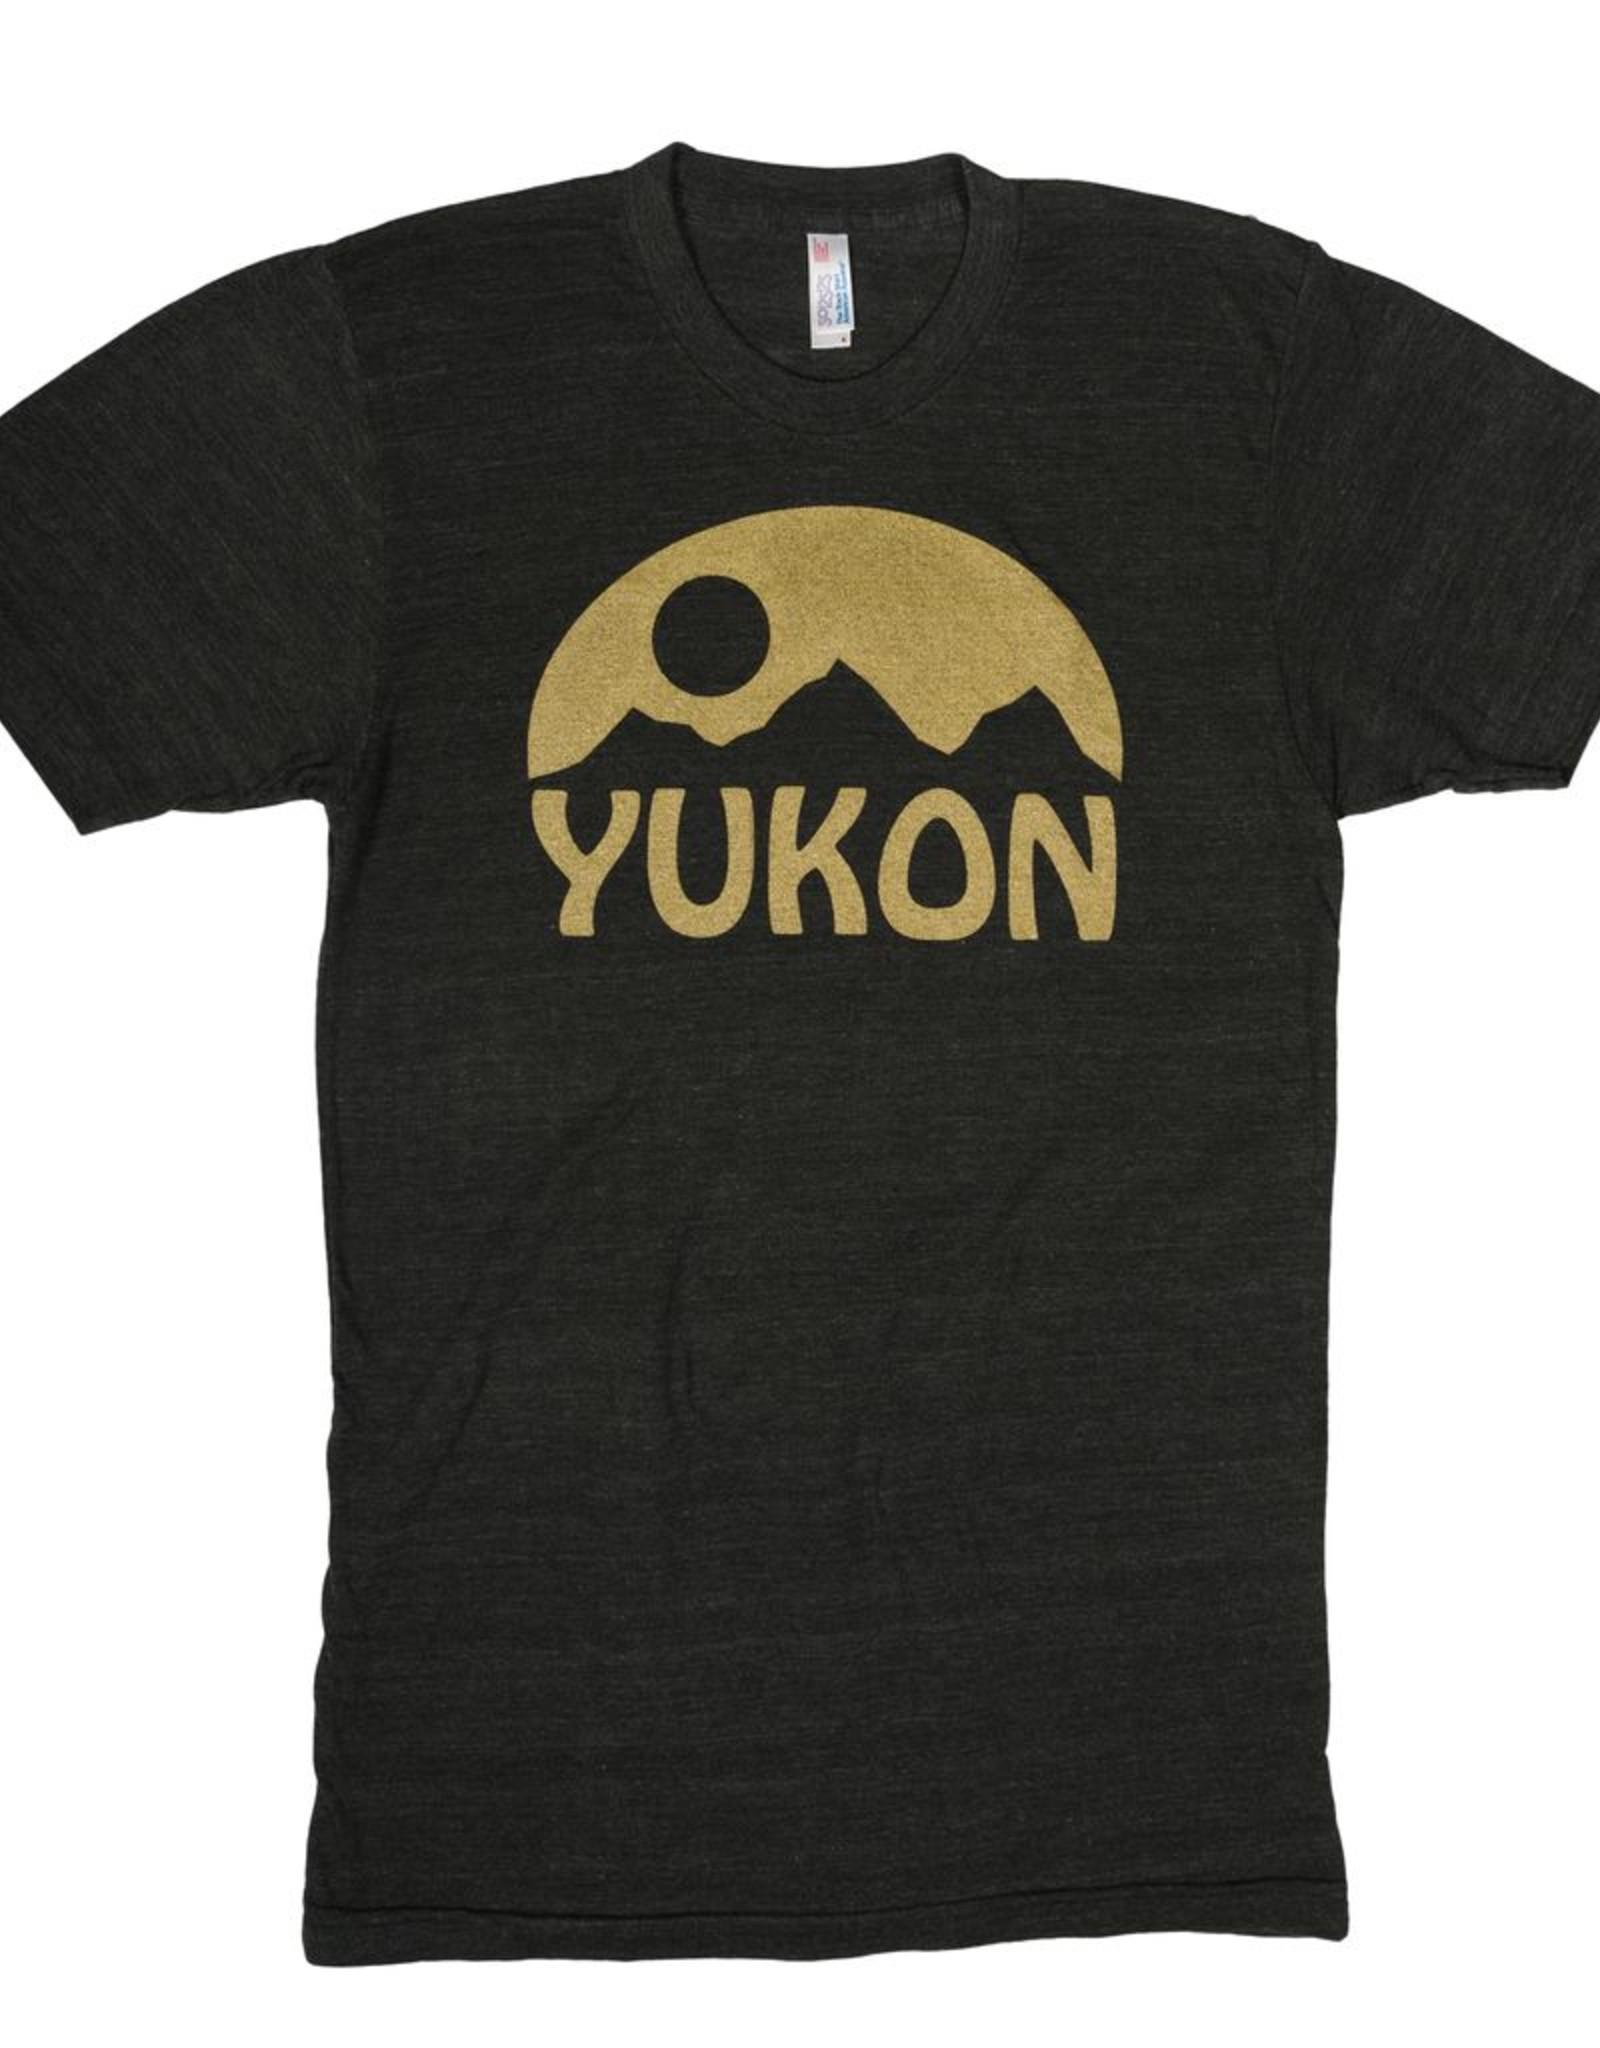 Men's Yukon Gold Mountain T-Shirt